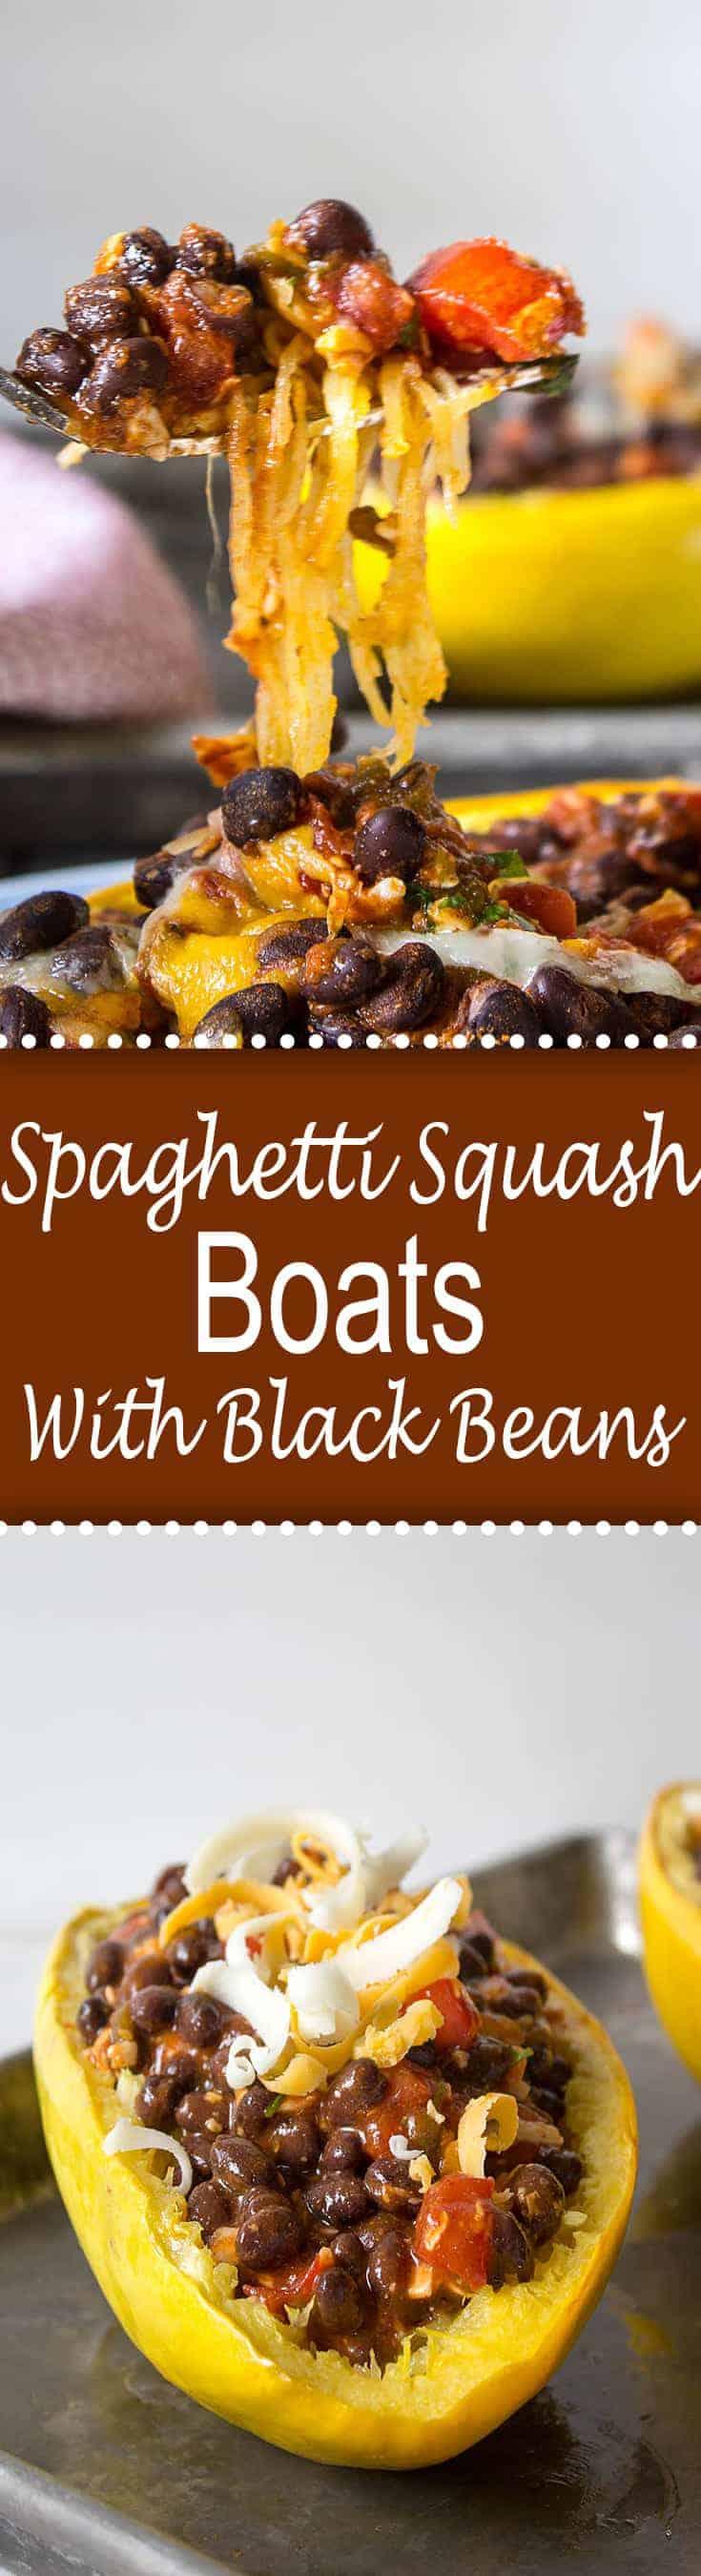 Spaghetti Squash Boats filled with a black bean enchilada filling.